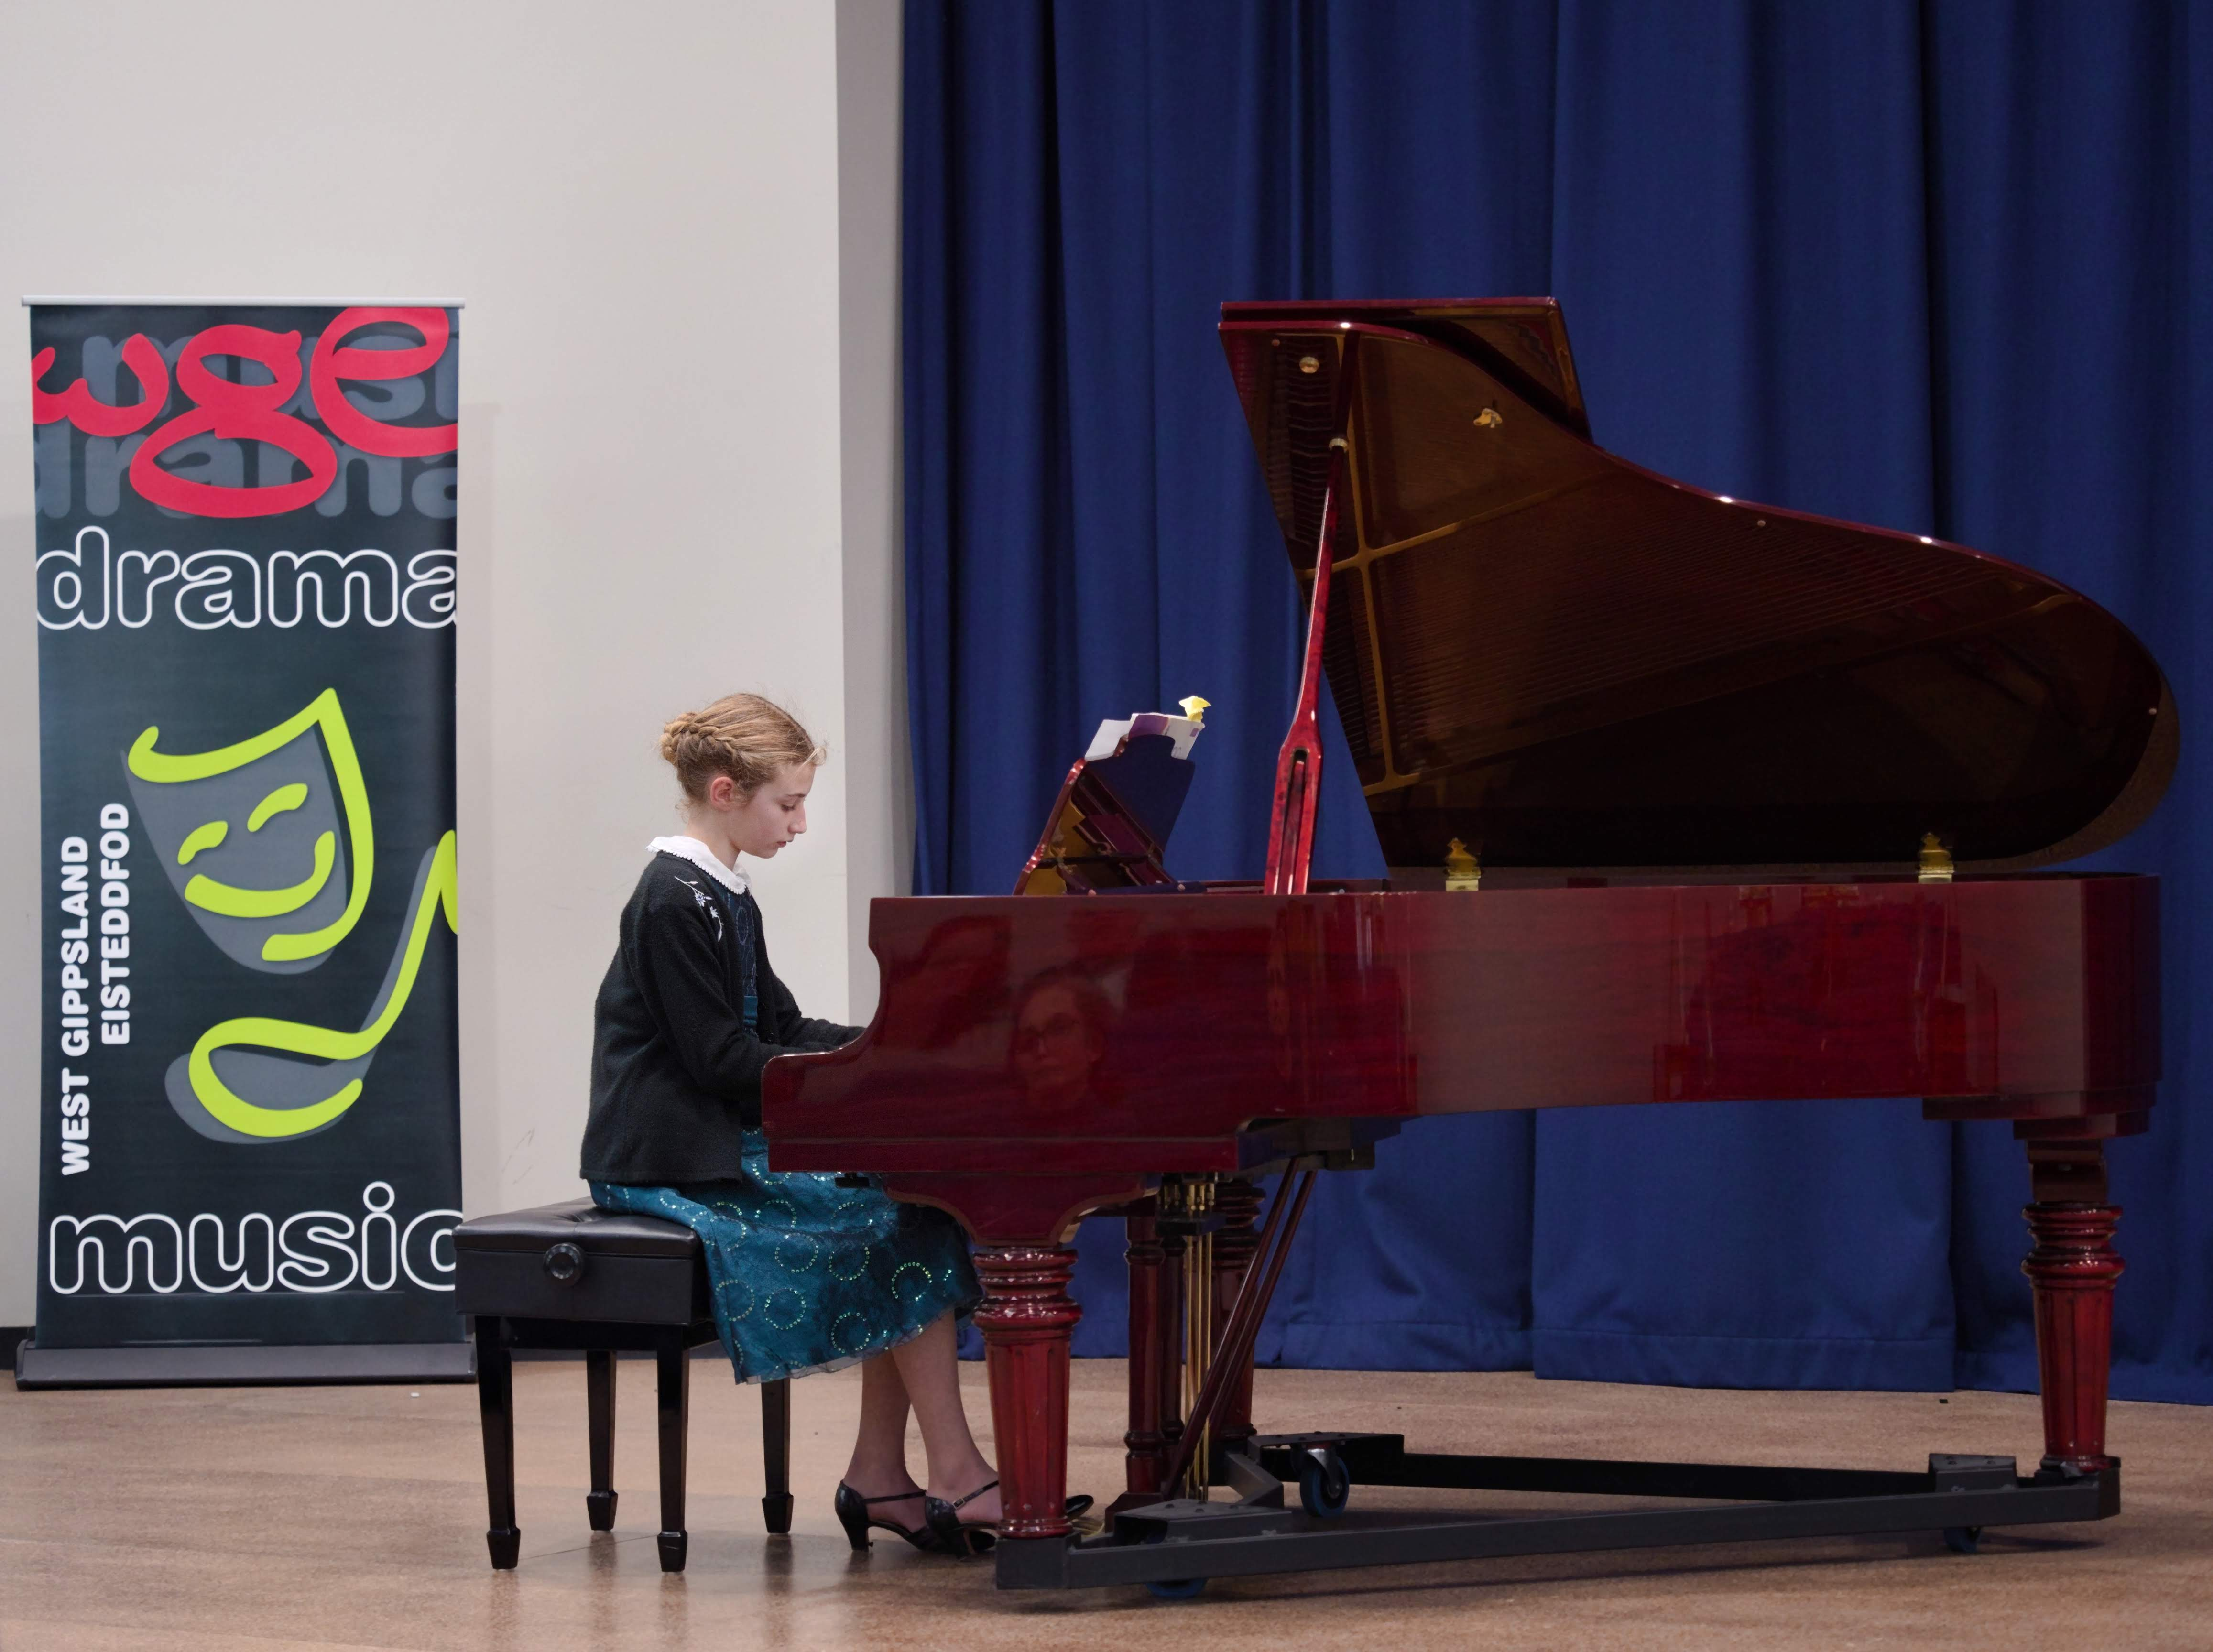 WGE Pianoforte Day 2 Adele Gillam Displays her Skills on the Piano